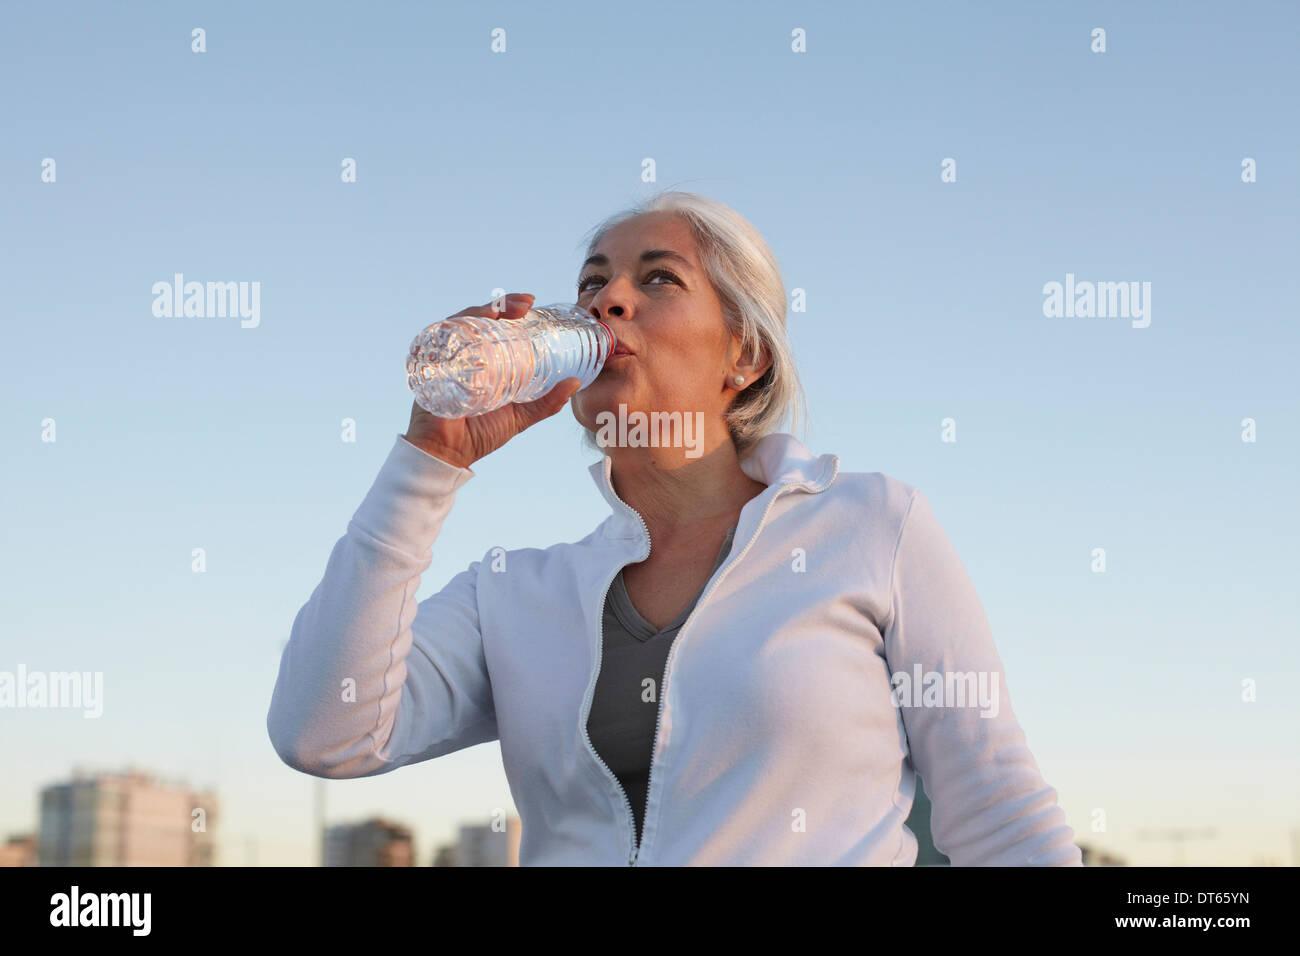 Reife Frau auf Gehtraining Stockbild